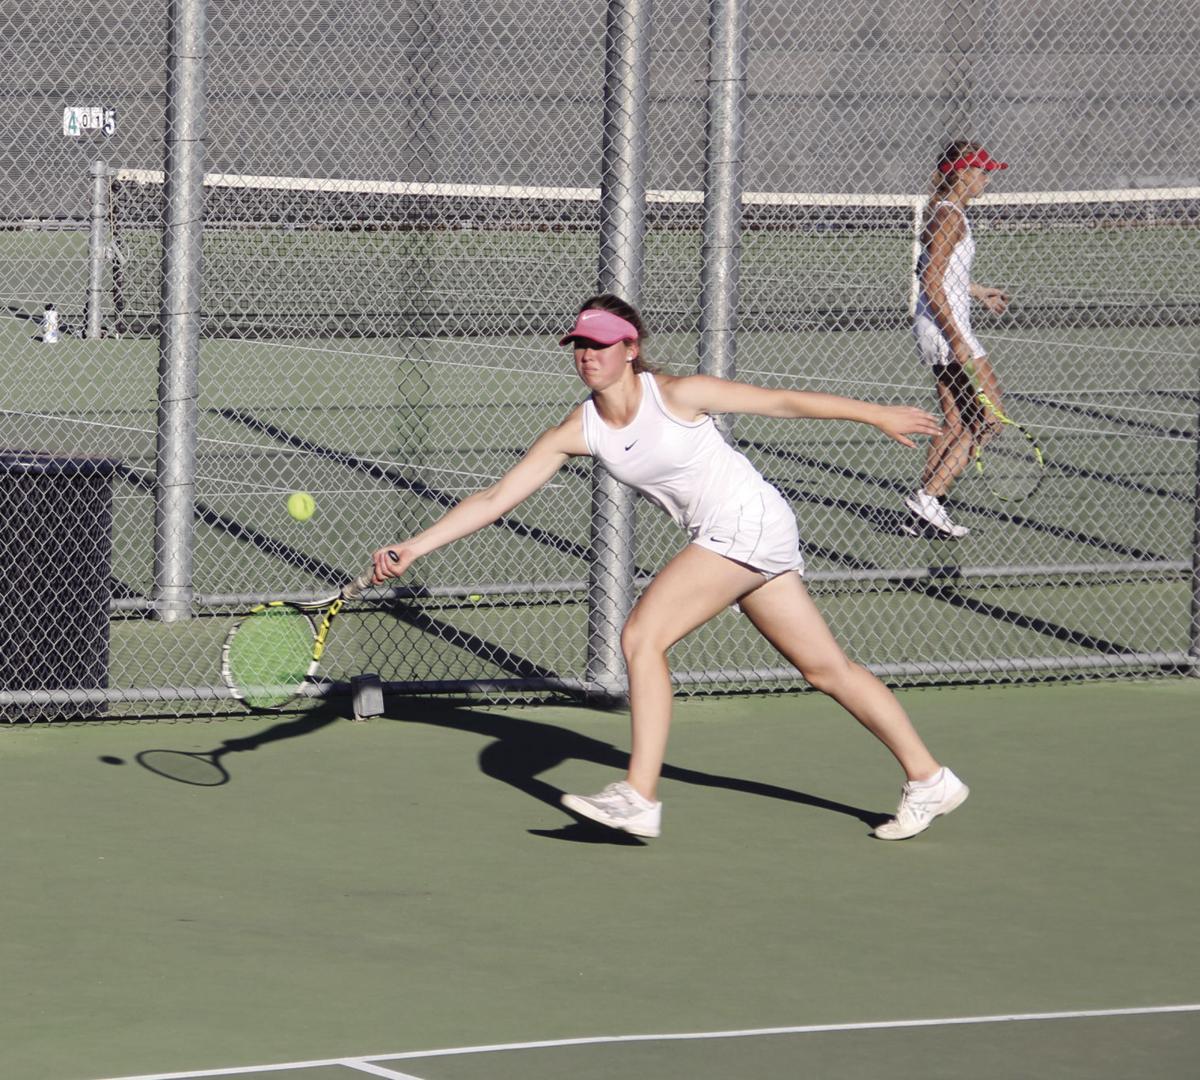 SJS D-II girls tennis playoffs: Lodi scores upset over No. 2 Vista del Lago